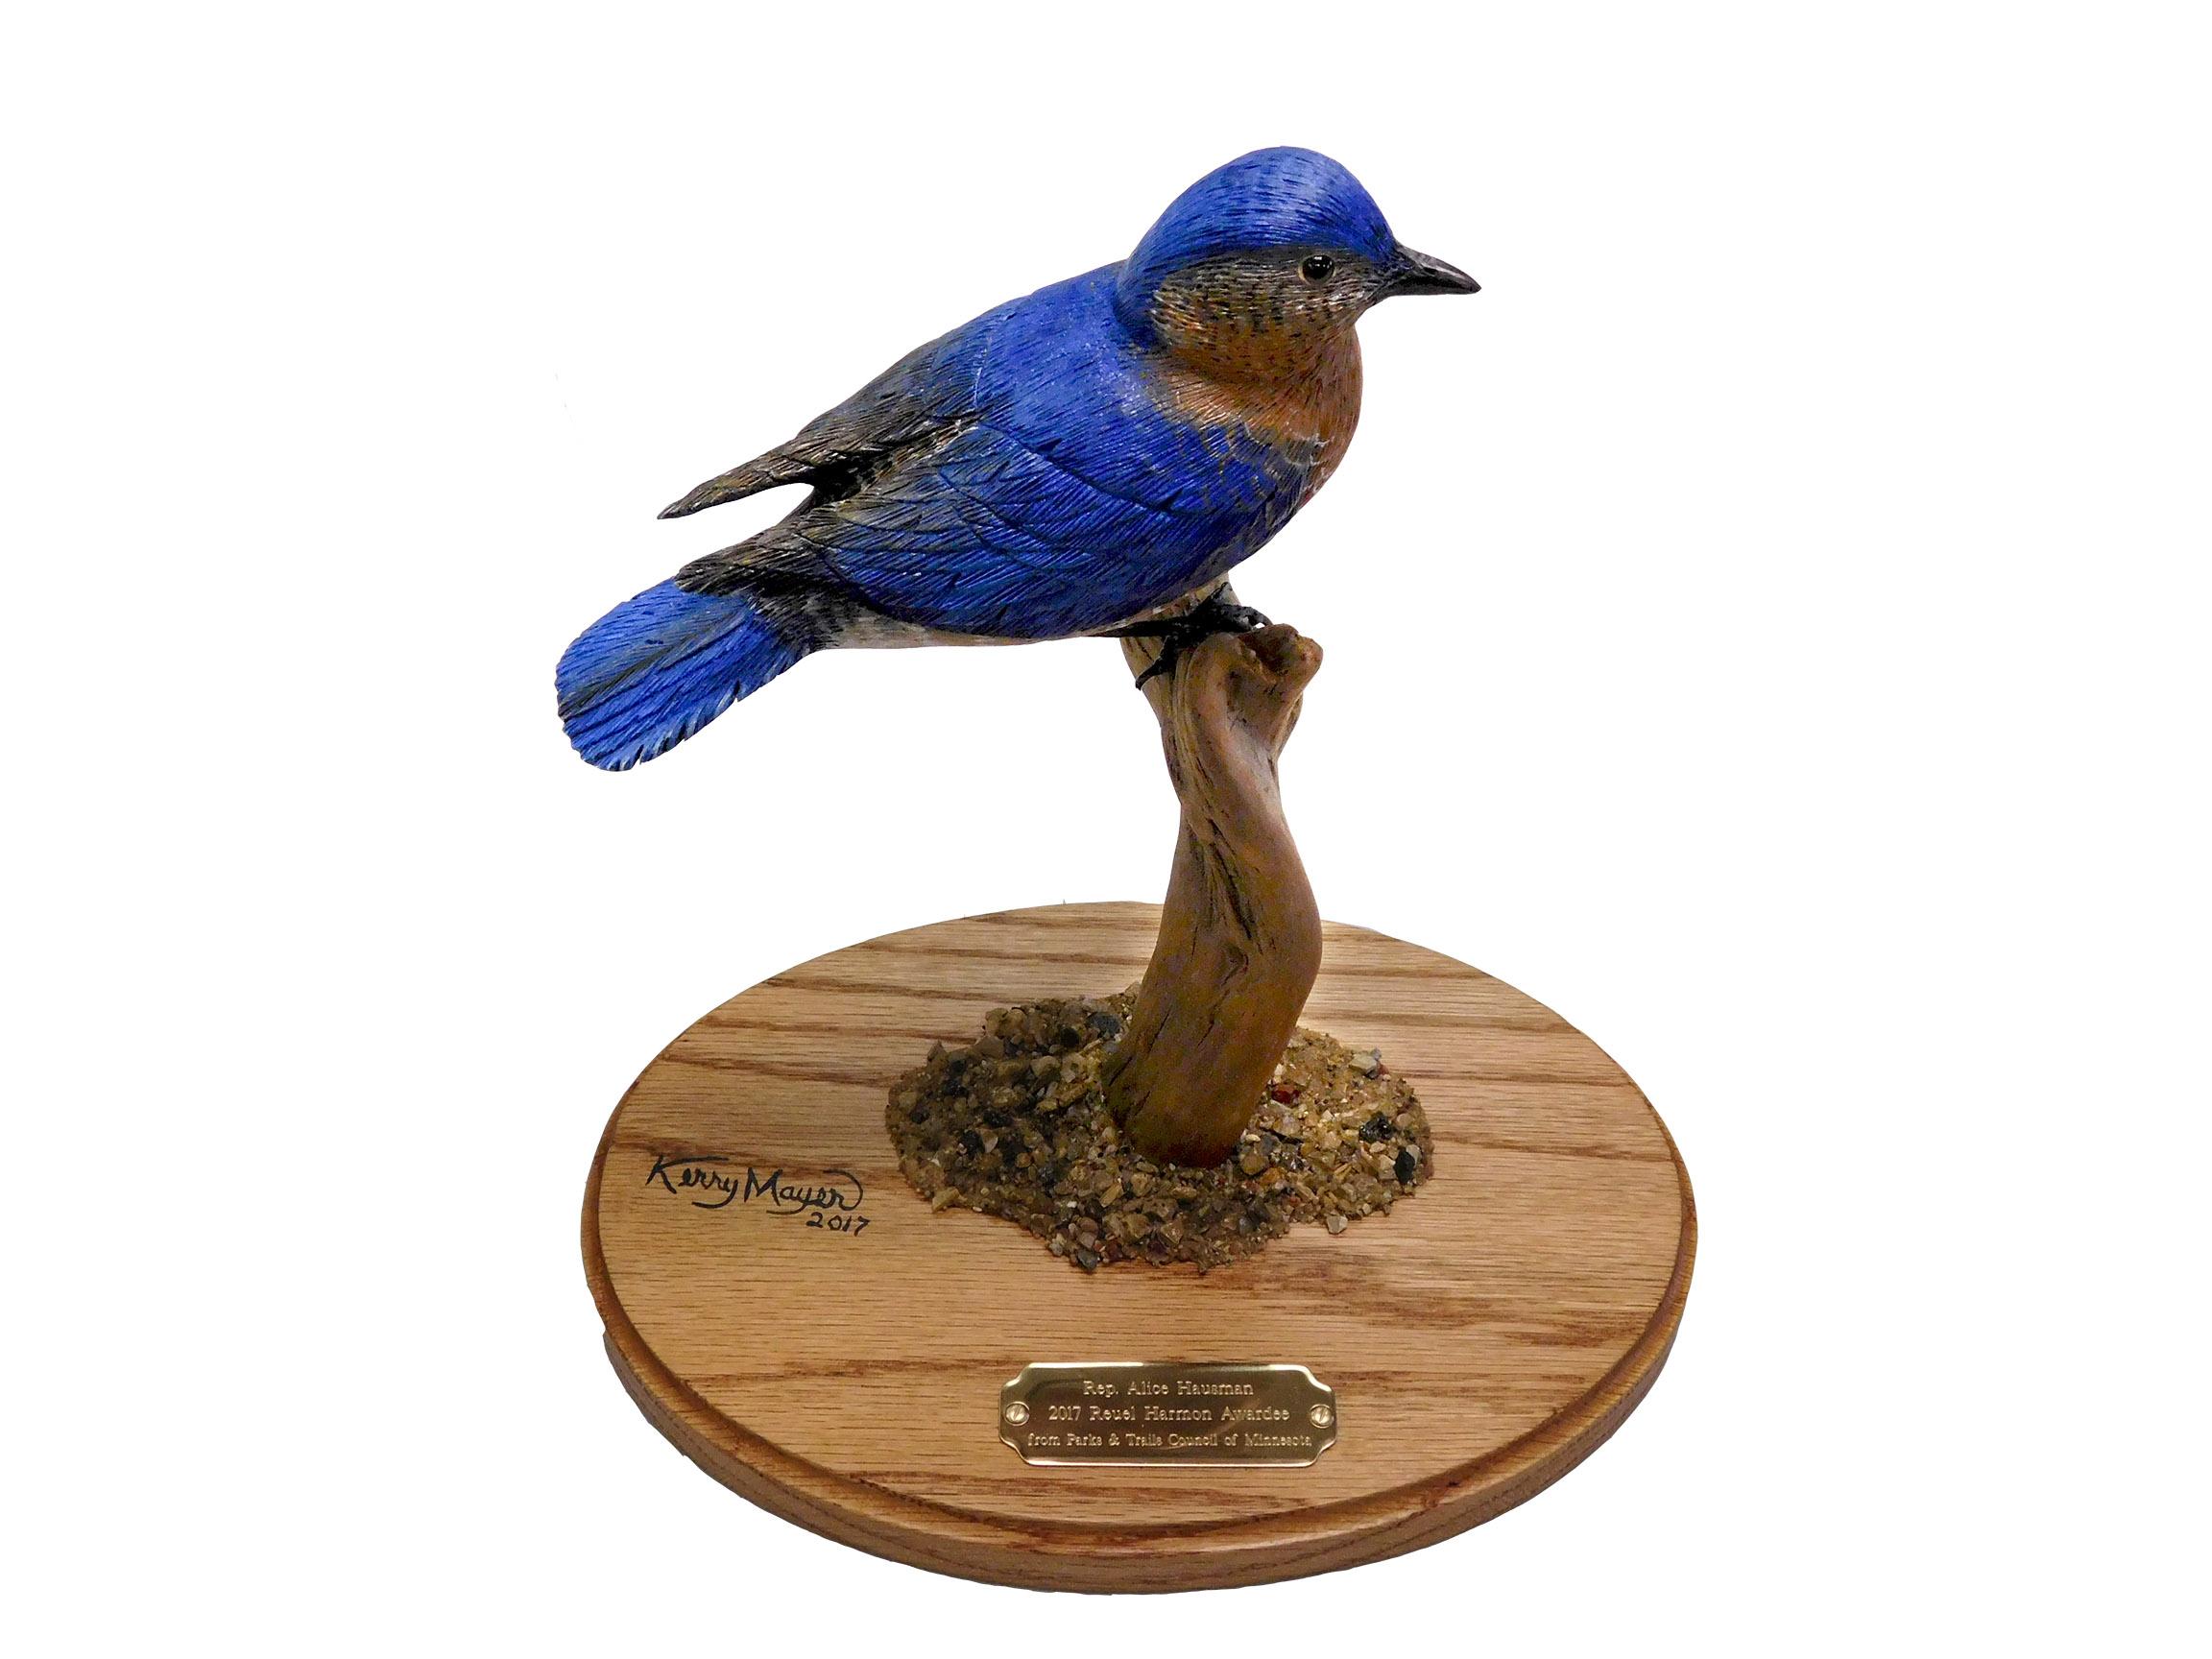 Carving of a bluebird on an award